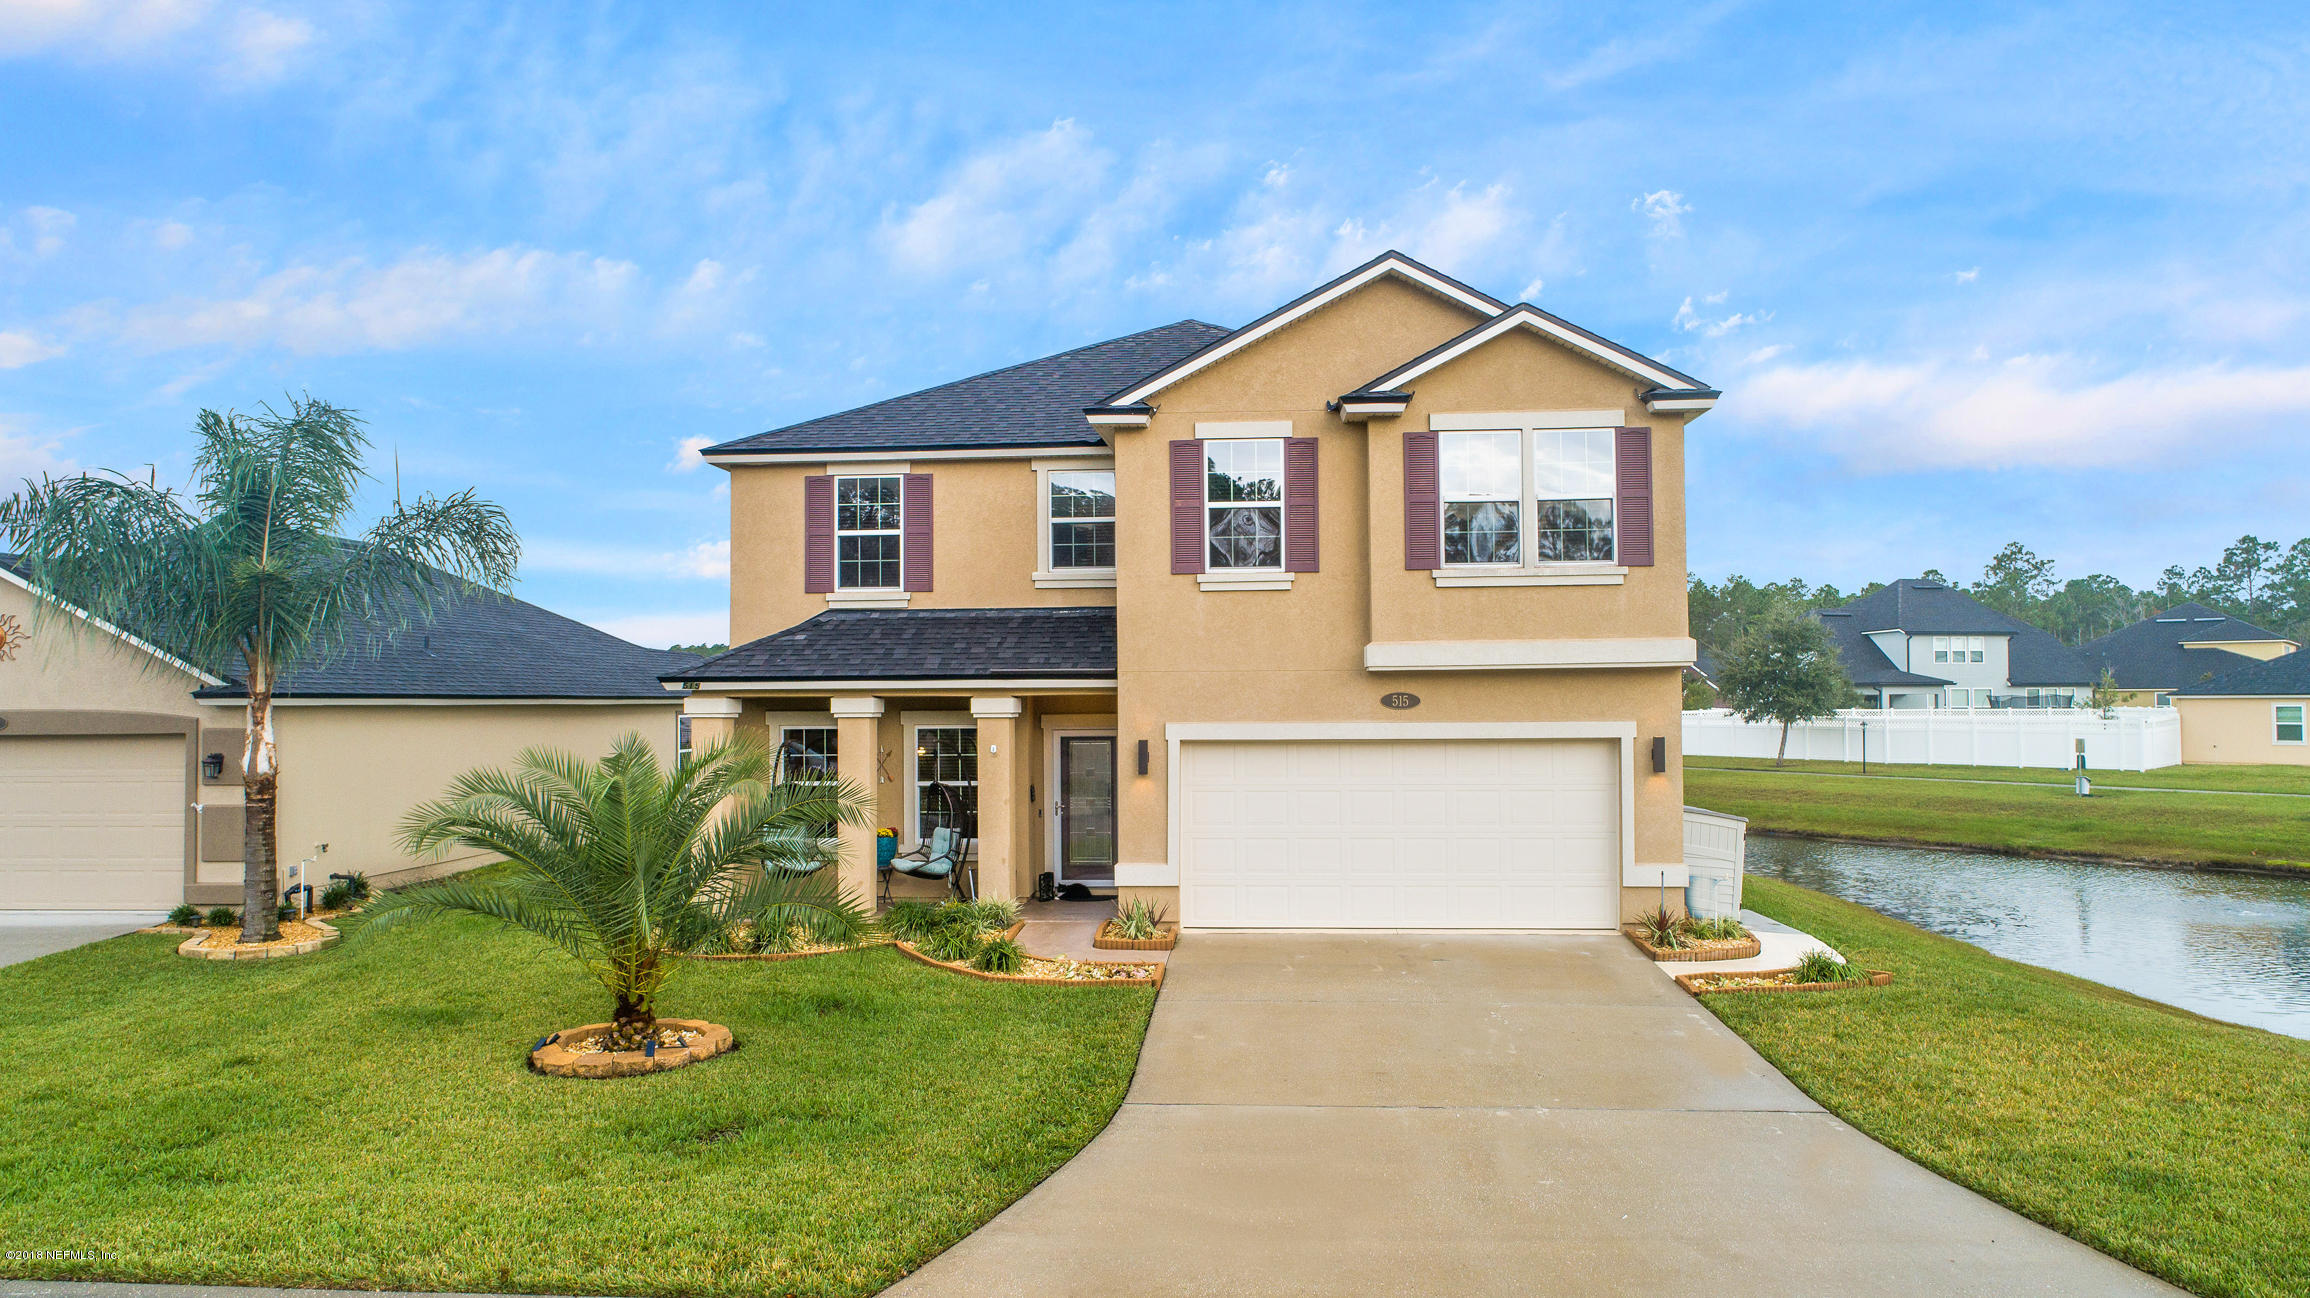 515 GLENDALE, ORANGE PARK, FLORIDA 32065, 5 Bedrooms Bedrooms, ,4 BathroomsBathrooms,Residential - single family,For sale,GLENDALE,968505